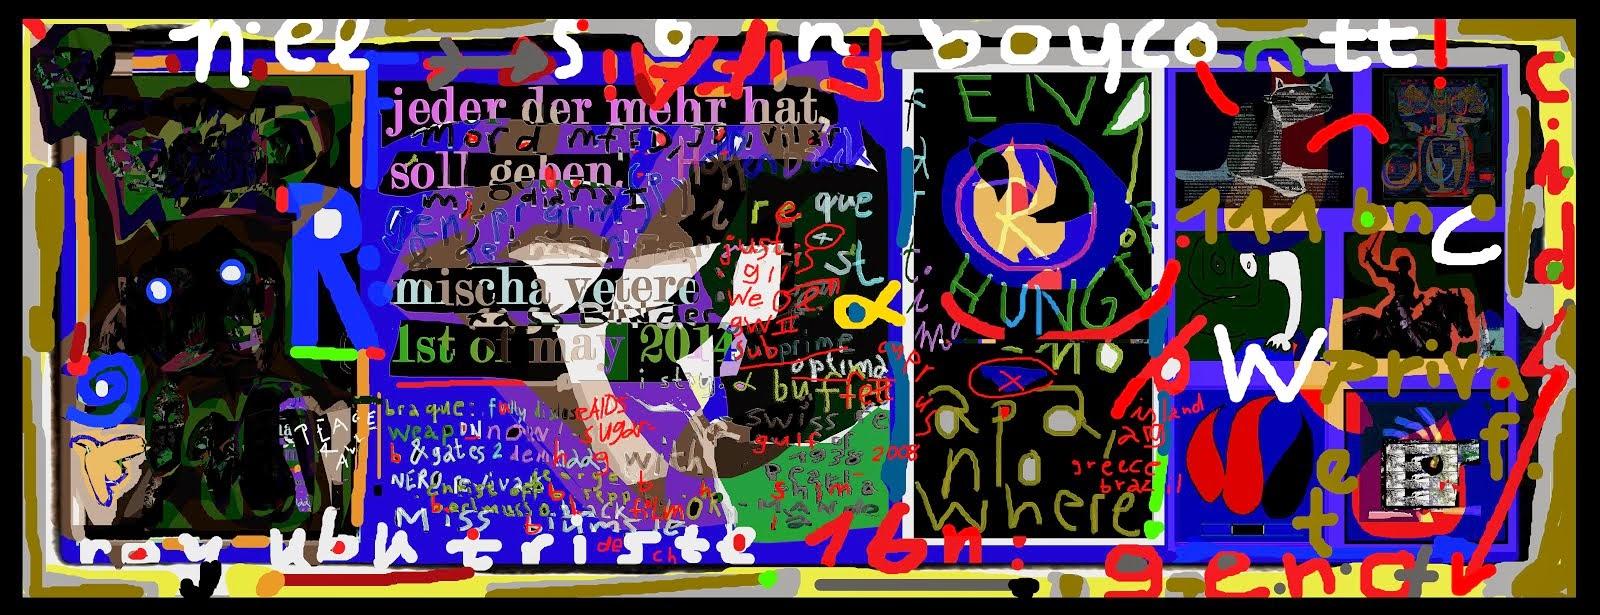 erster mai DIE GEISTIGE REVOLUTION mischa vetere berlin hamburg vive la revolución